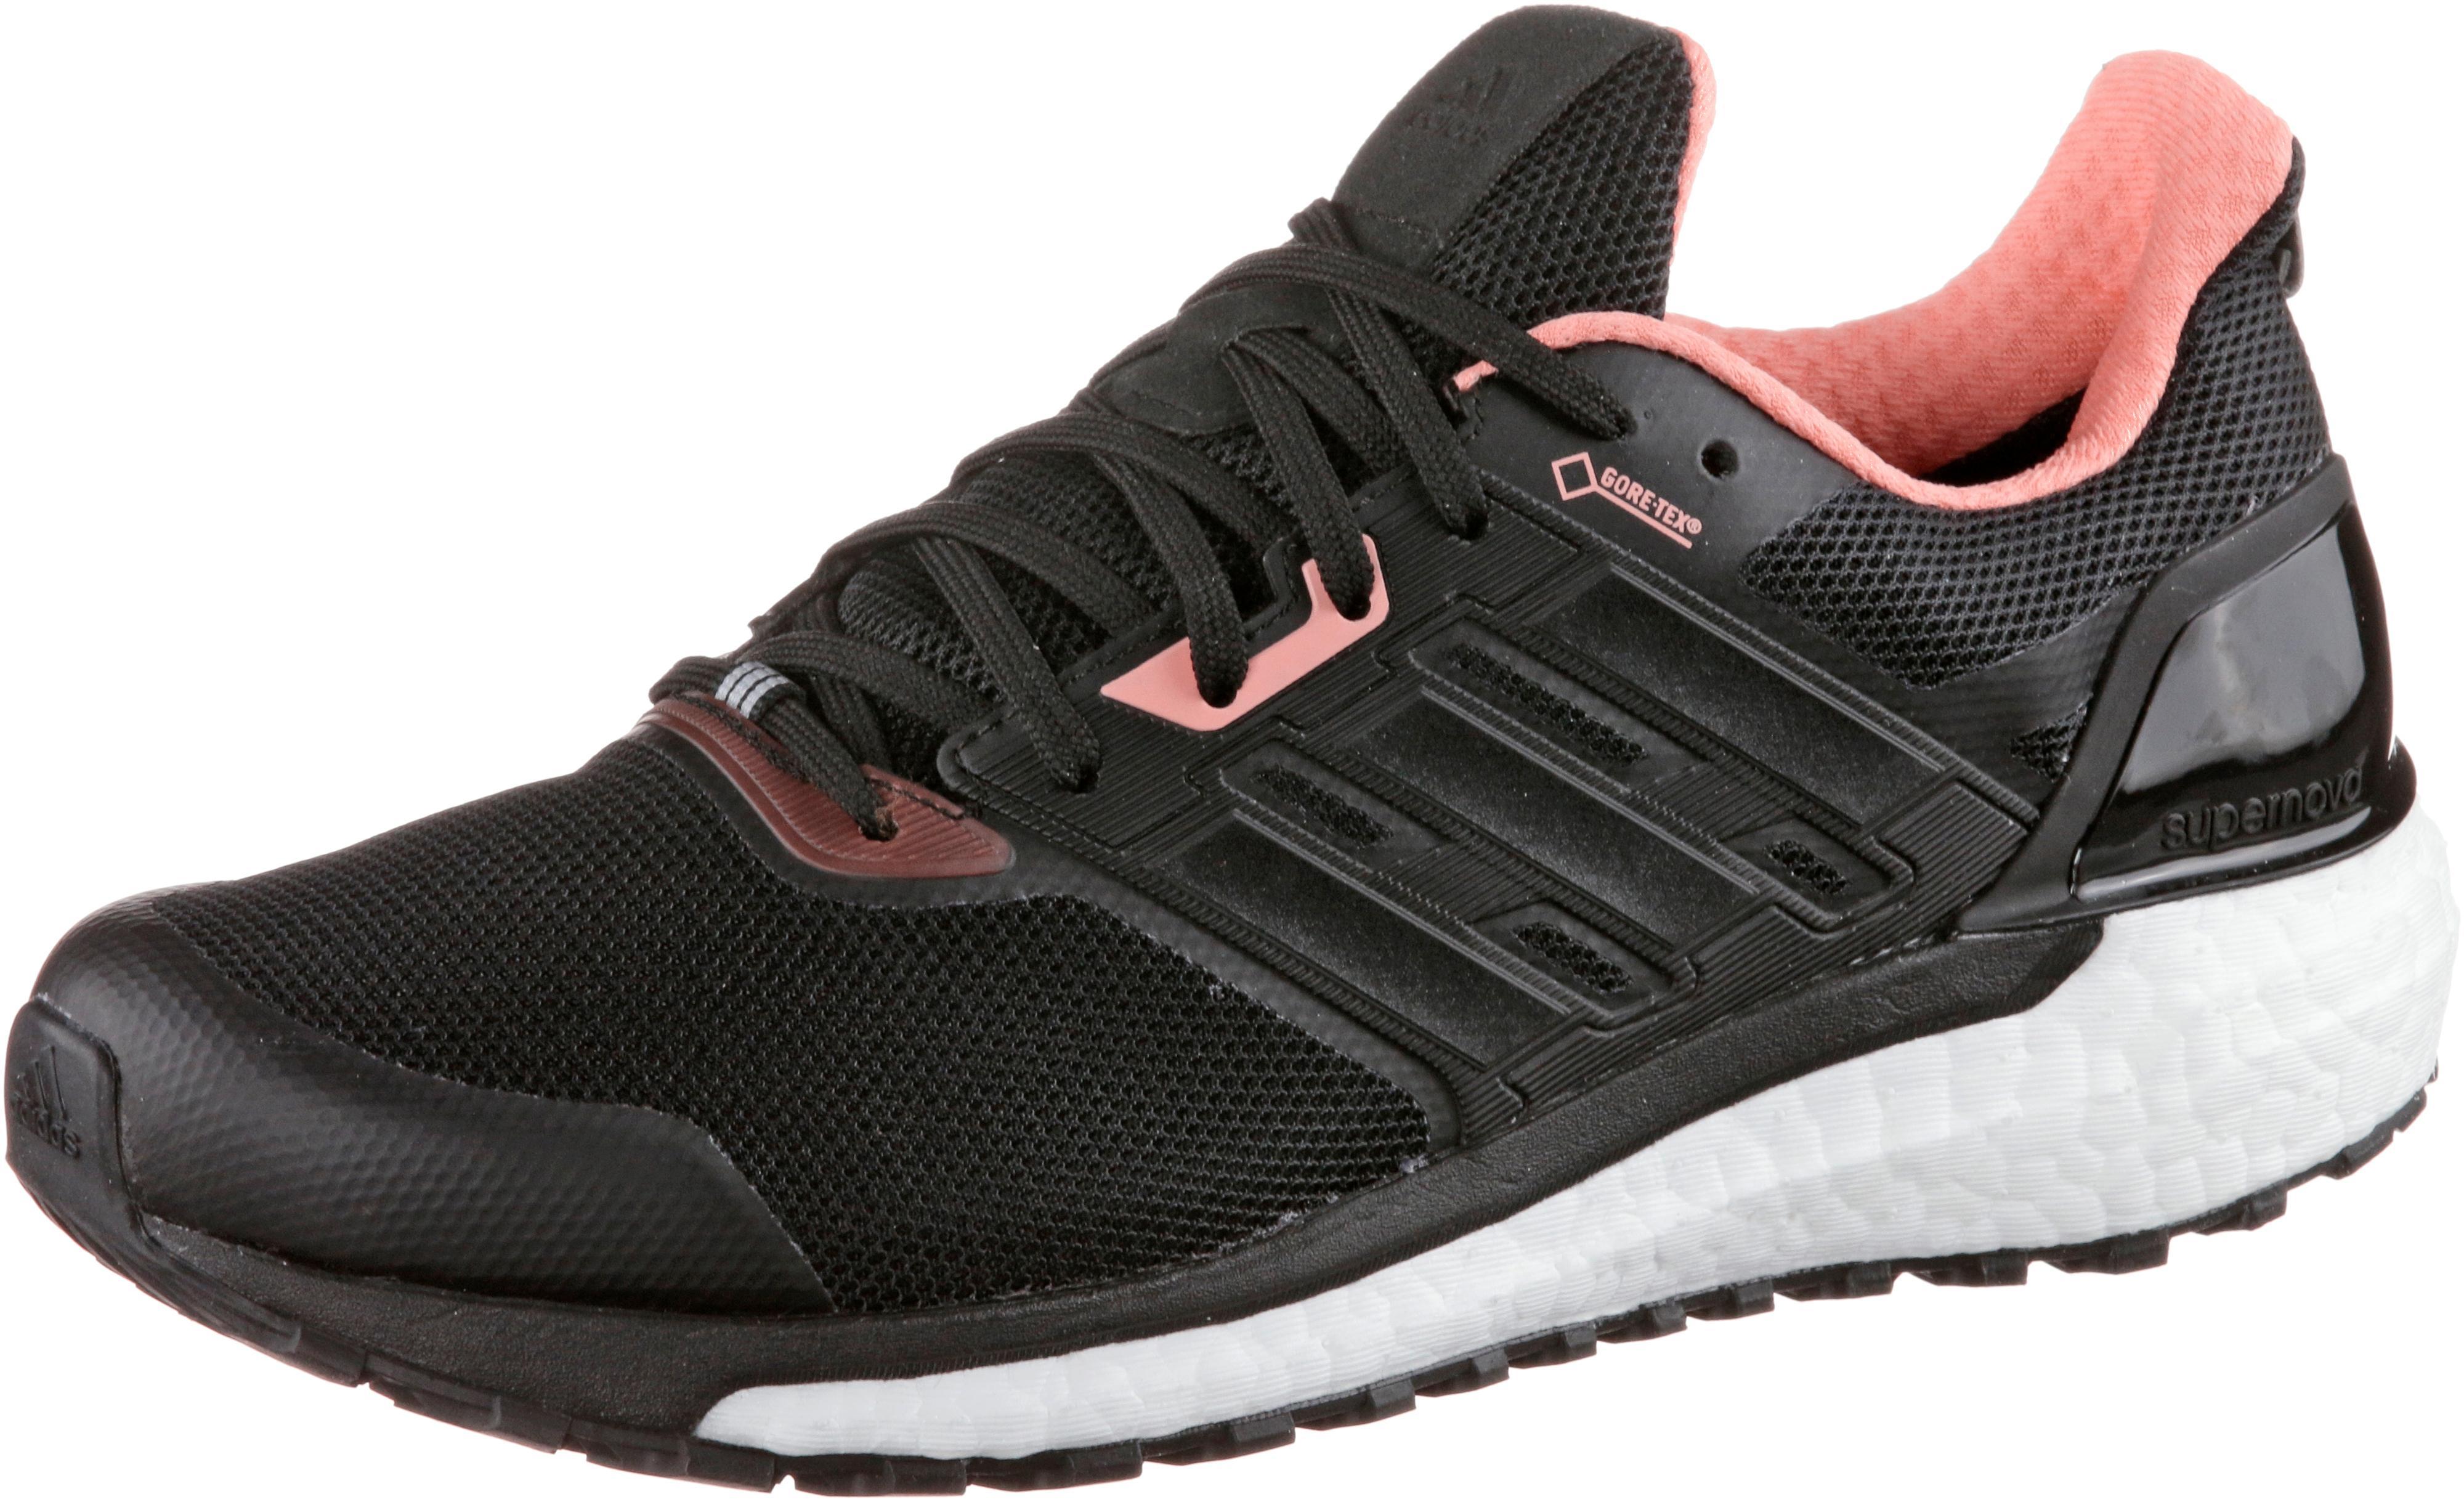 separation shoes f1c2e cc2a7 Adidas supernova gtx Laufschuhe Damen core black im Online Shop von  SportScheck kaufen